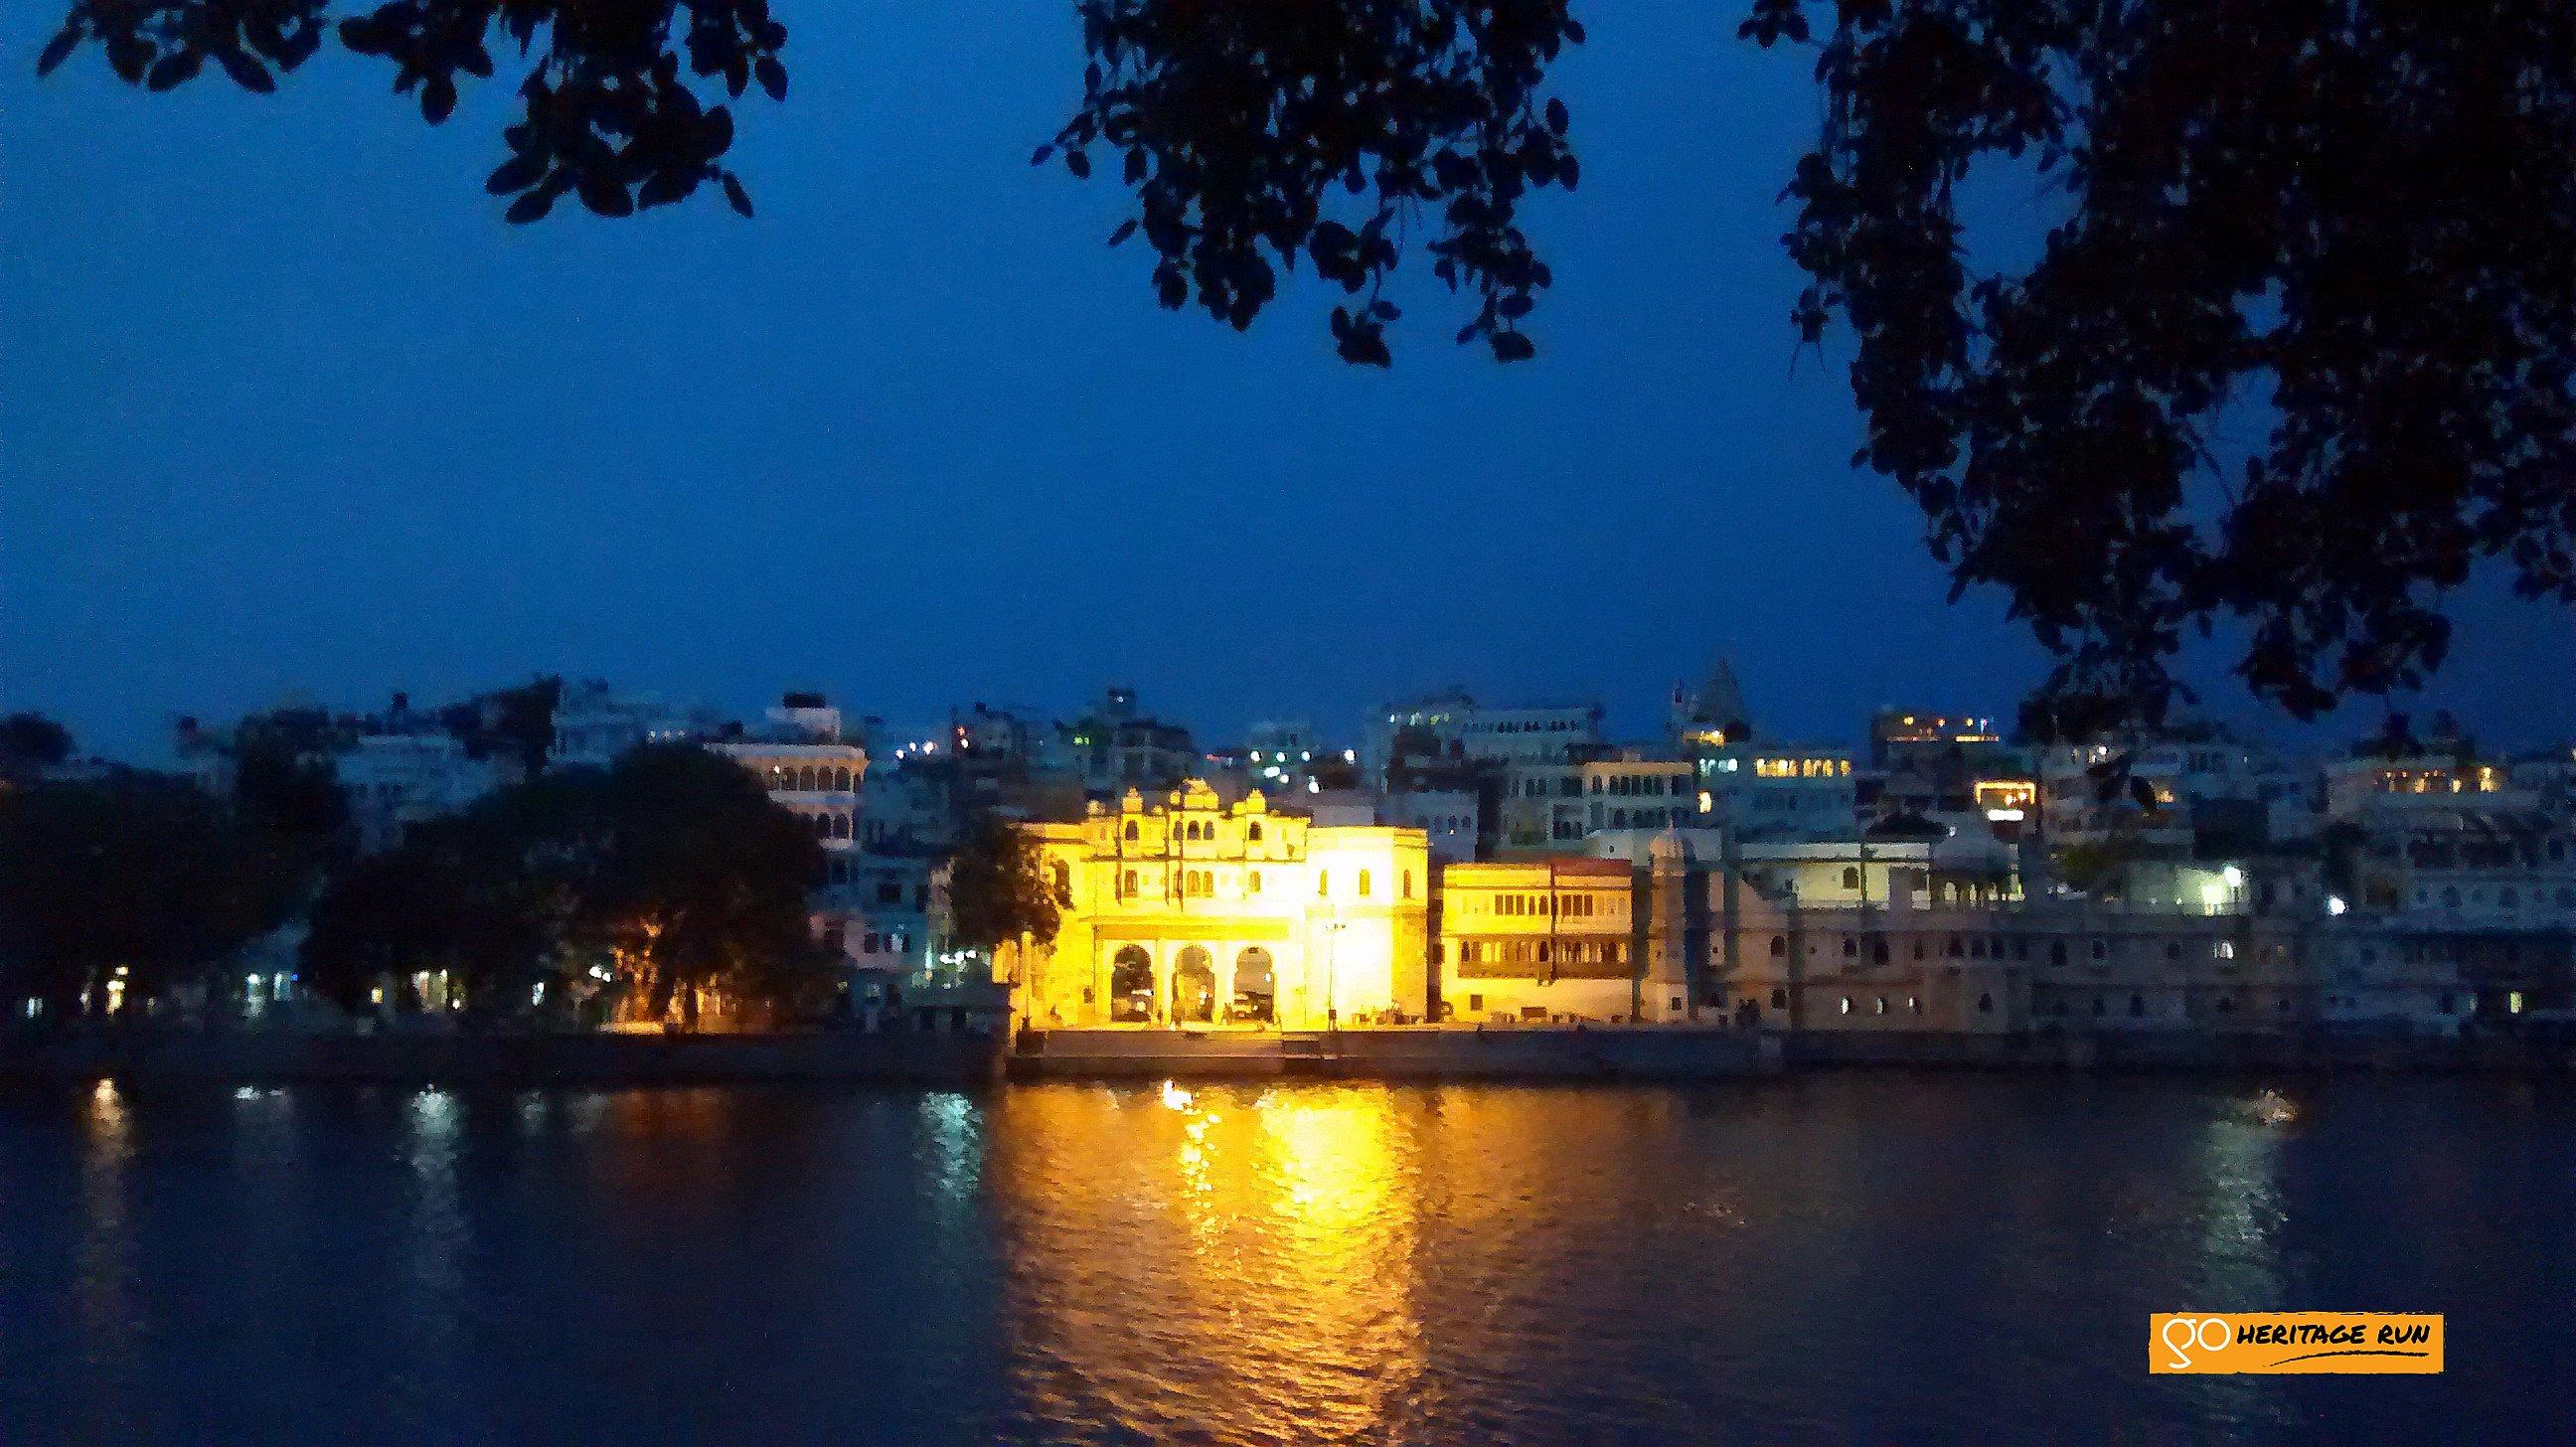 Bagor haveli from Ambrai ghat